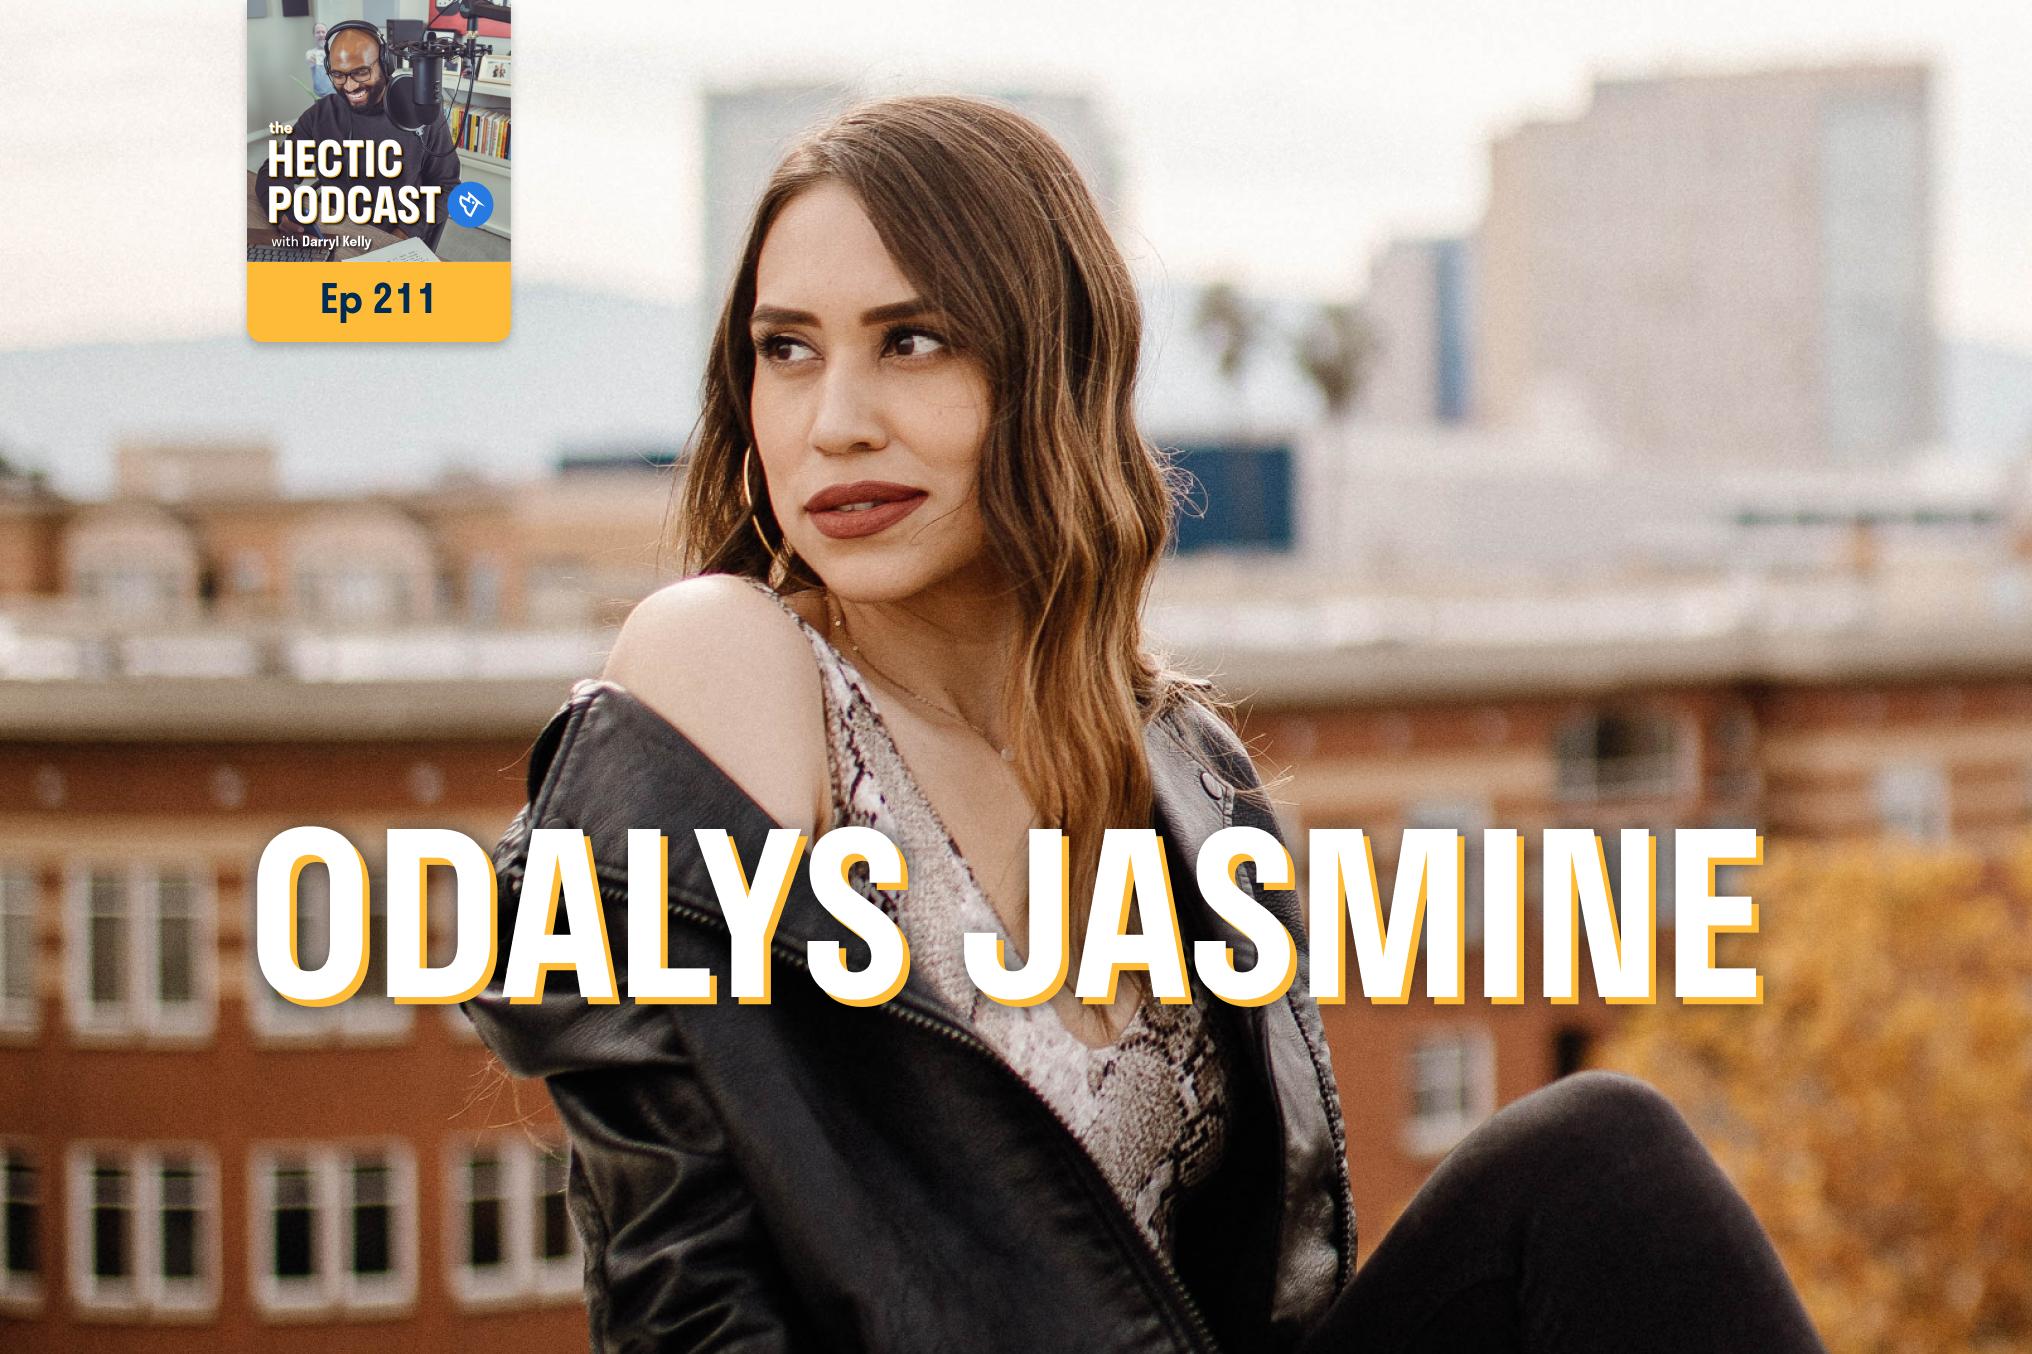 Odalys Jasmine